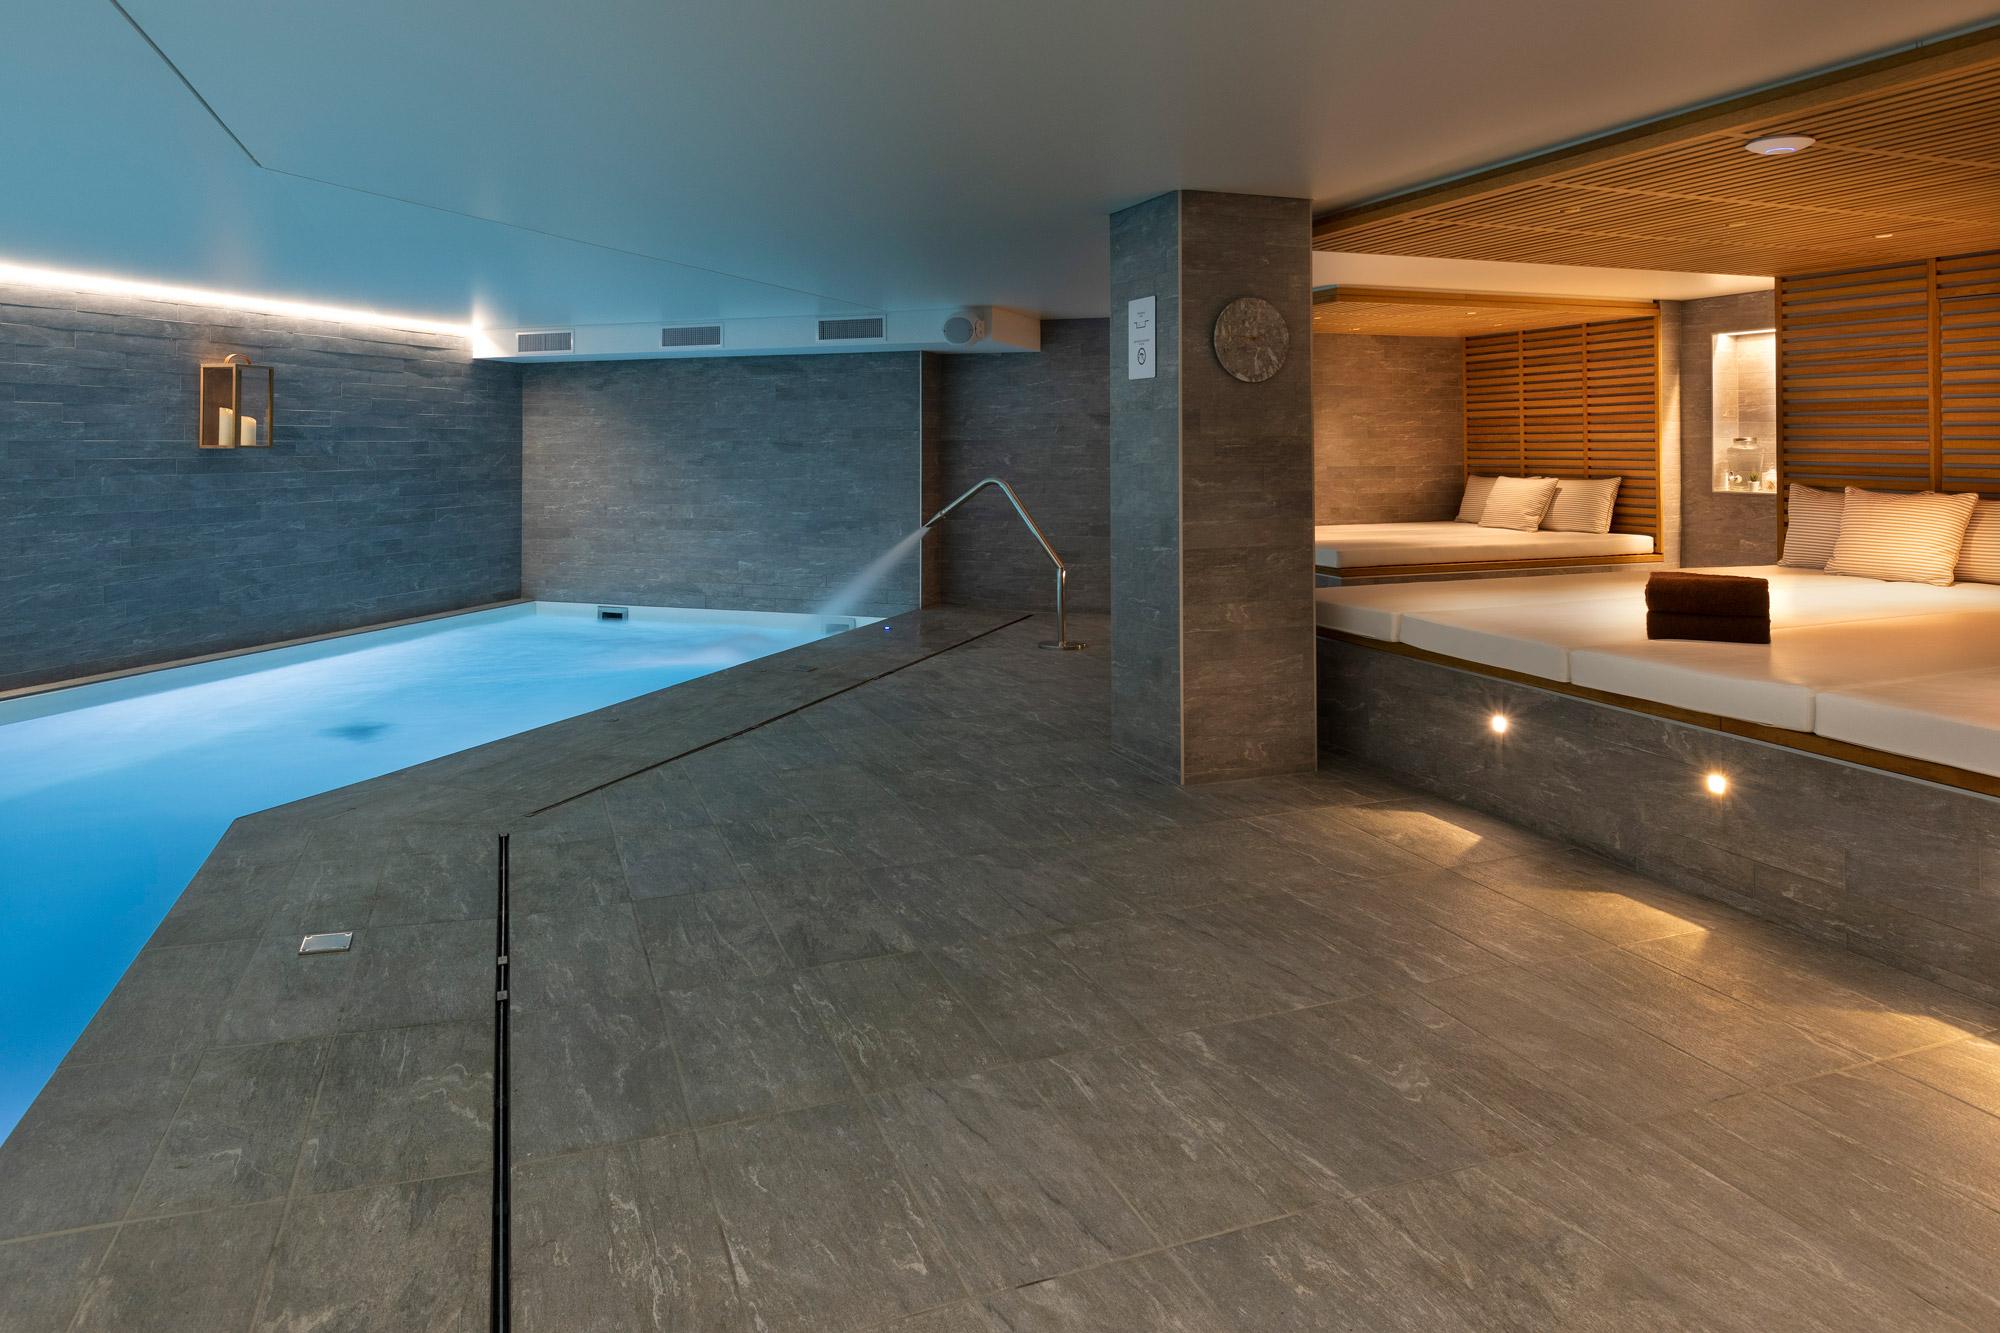 St-Alban-Hotel-&-Spa—Piscine-(2)